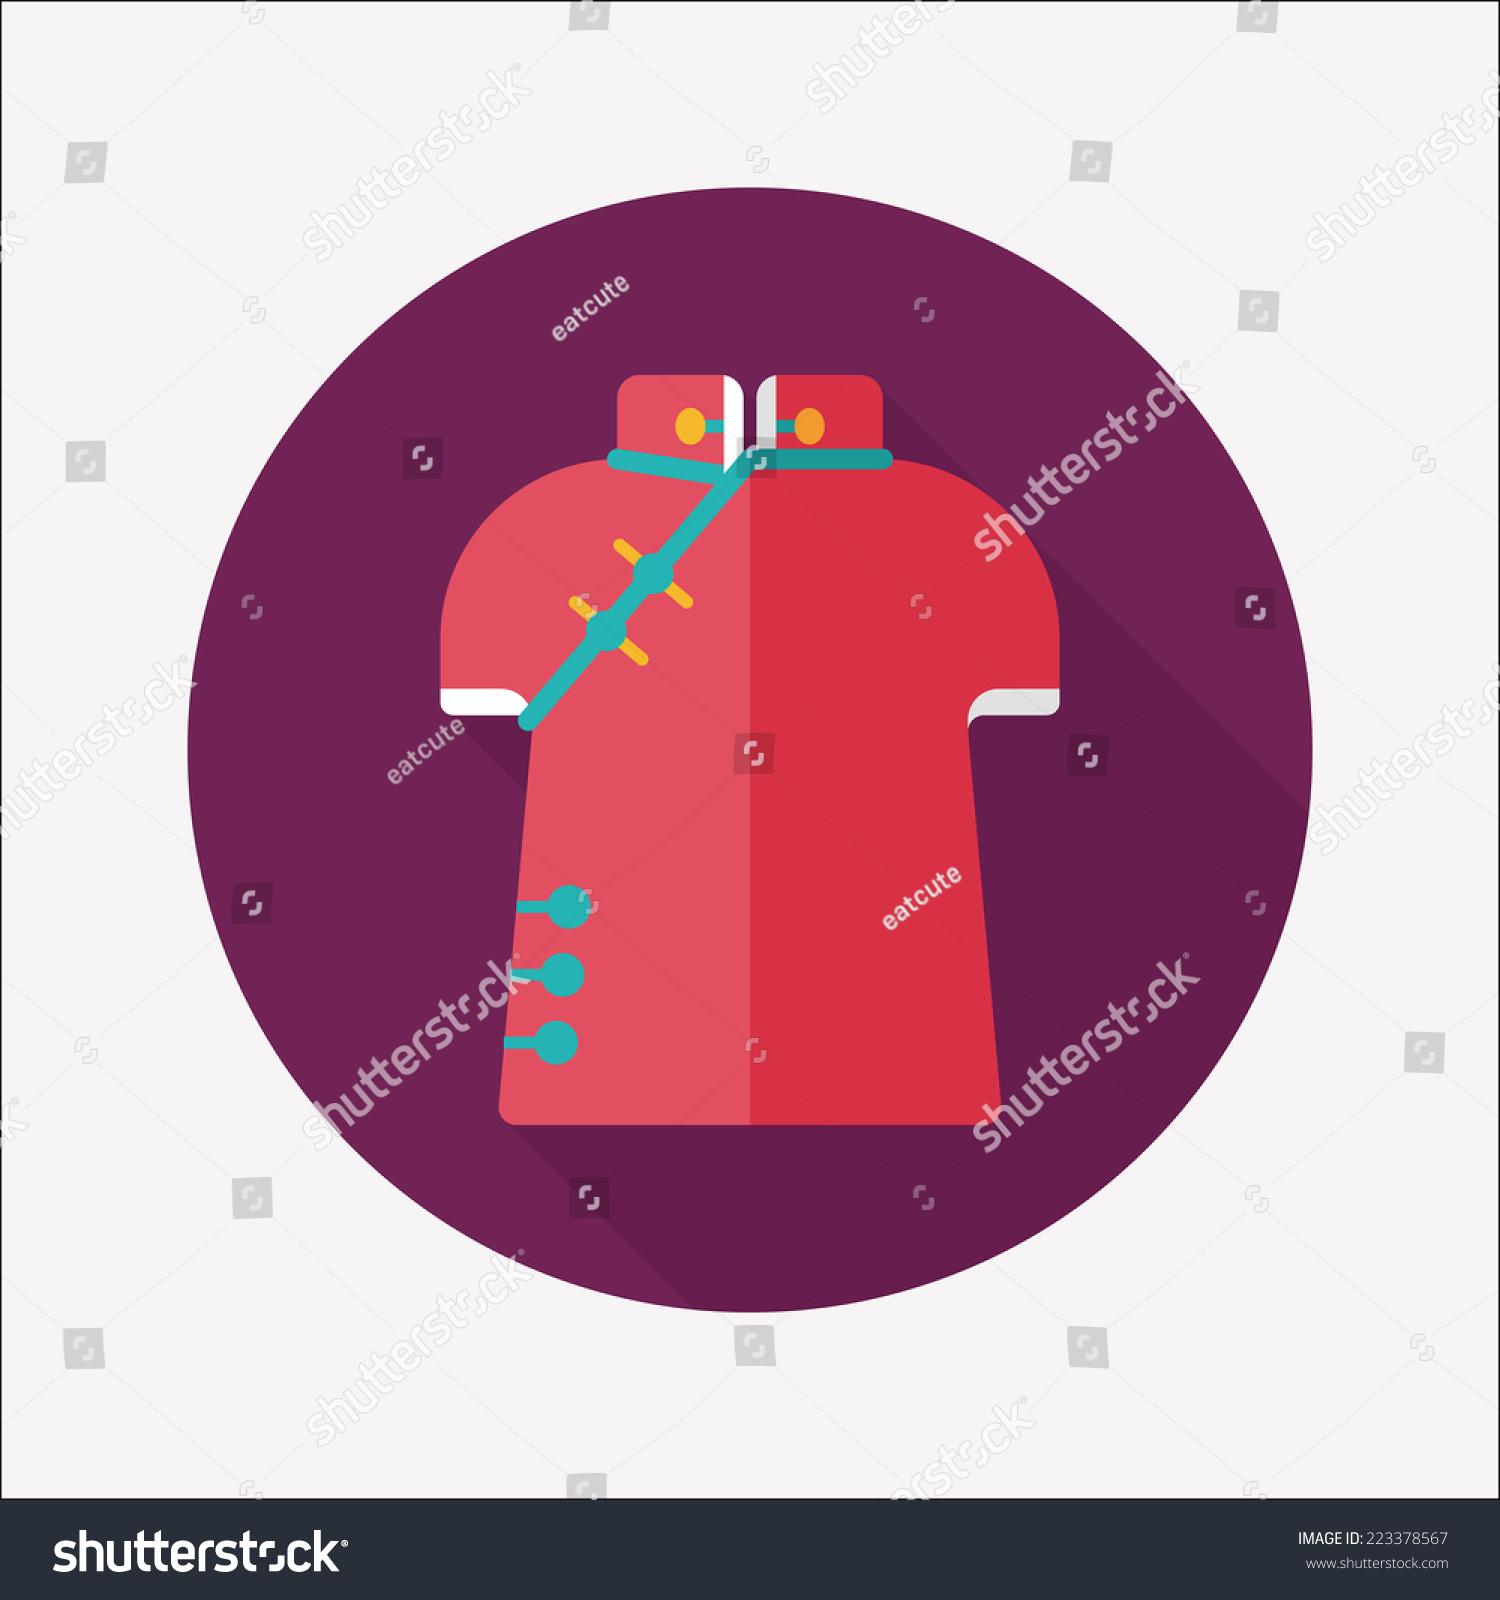 ppt小图标红色装饰素材